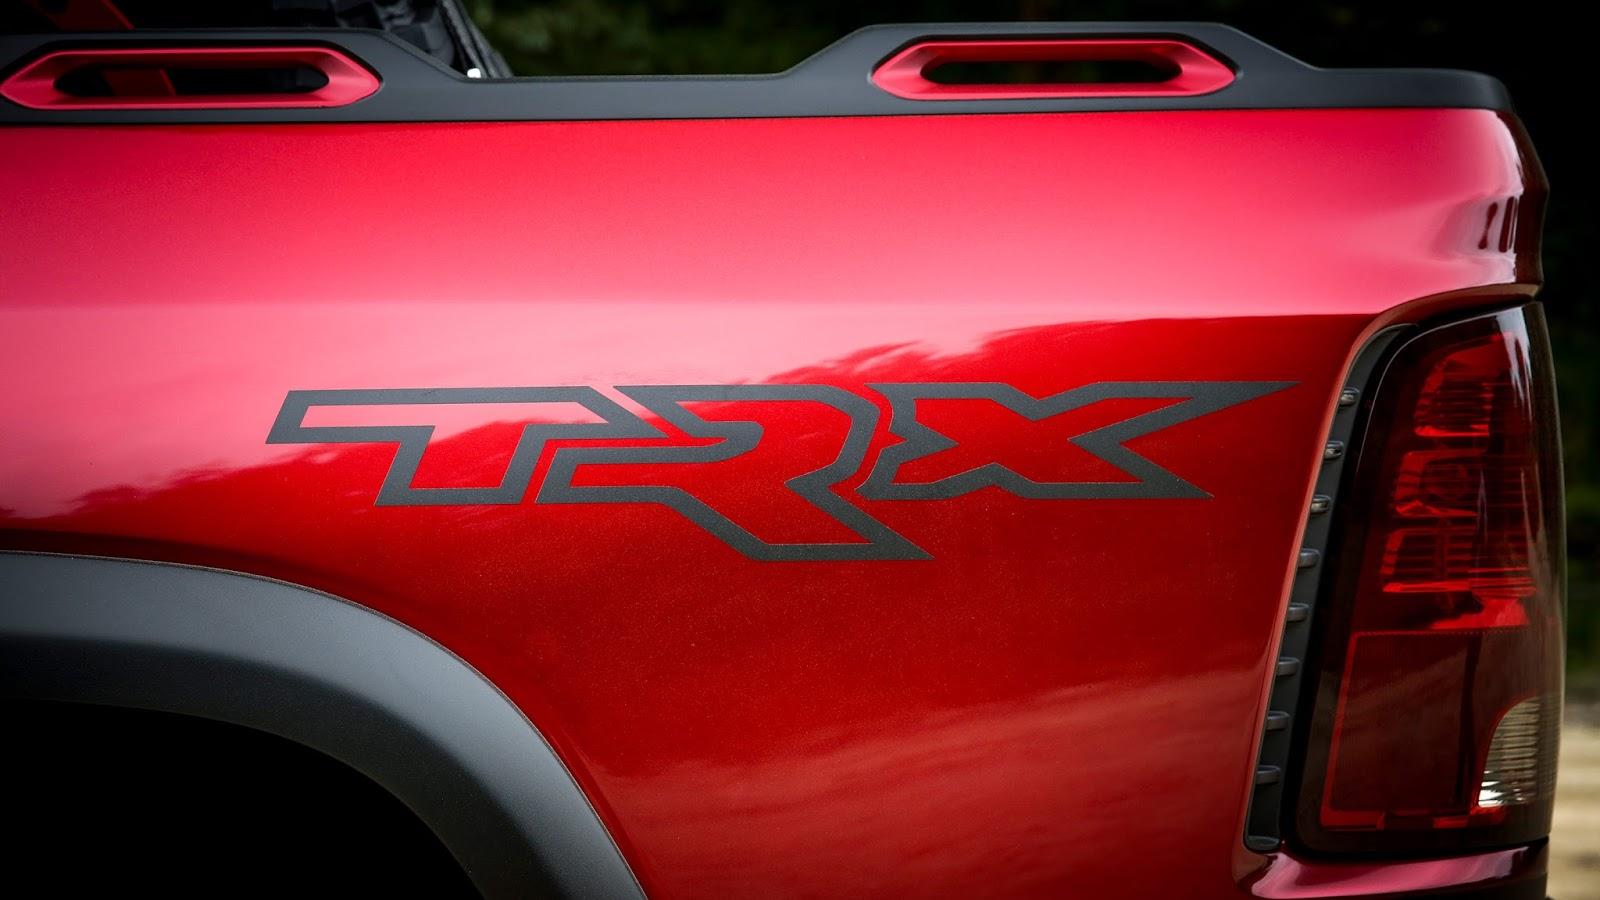 Larry H Miller Dodge Ram Cherry Creek Ram Trucks Reveals New